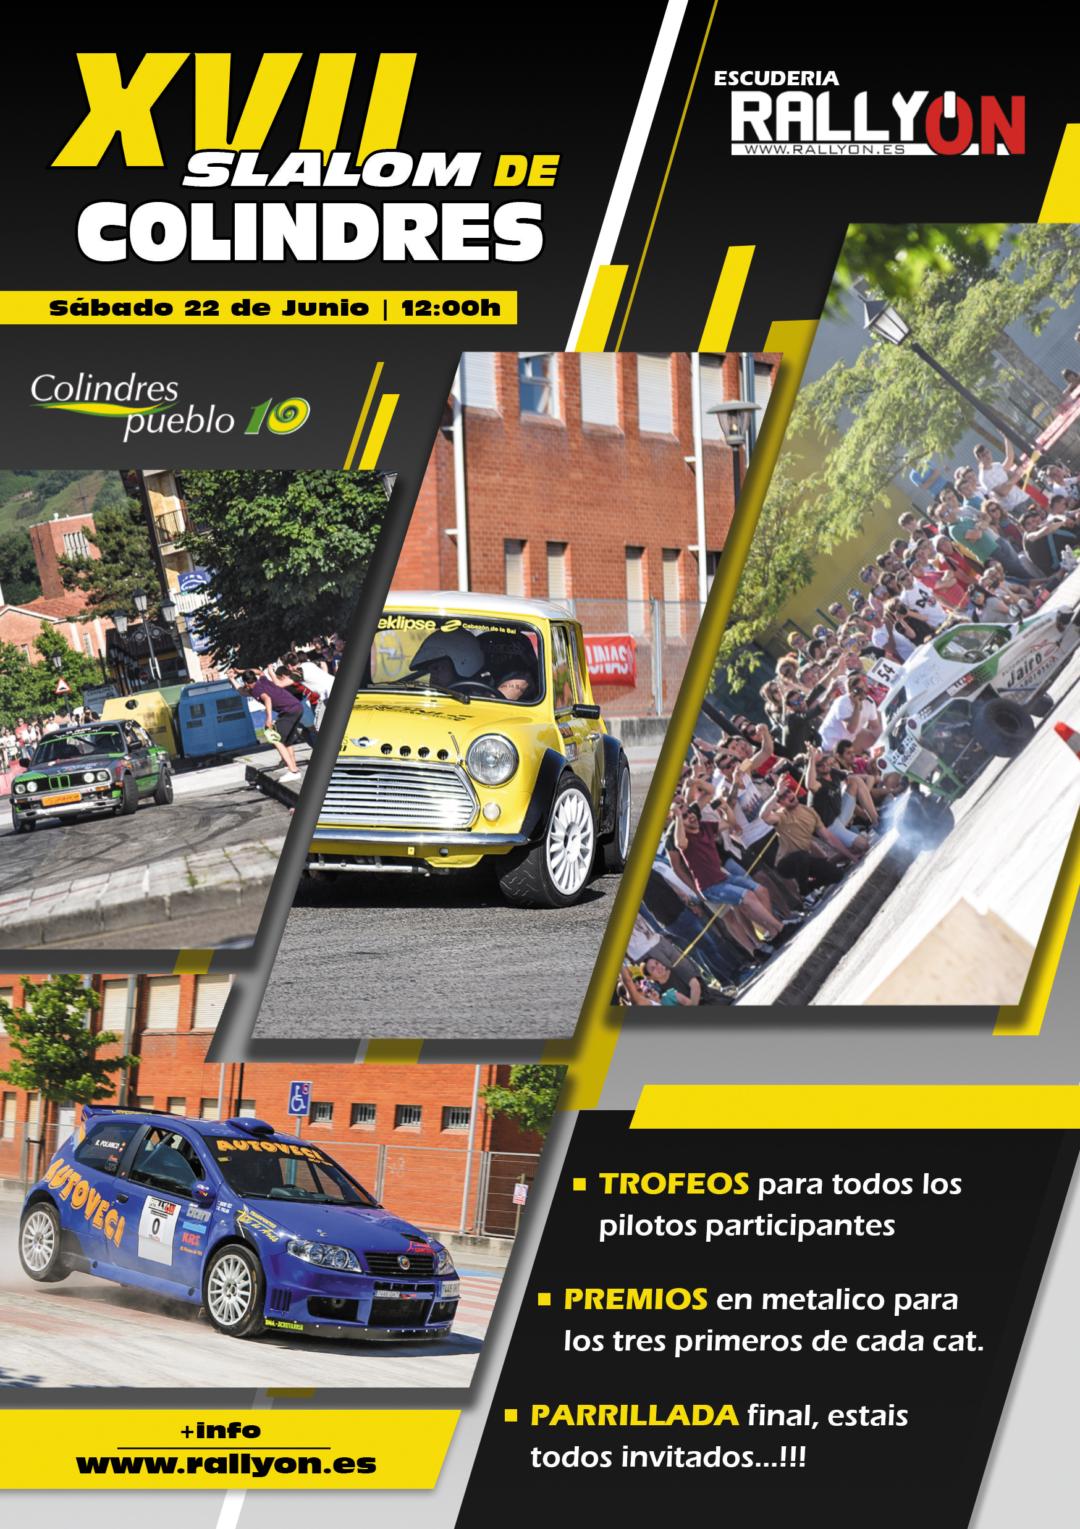 XVII SLALOM DE COLINDRES